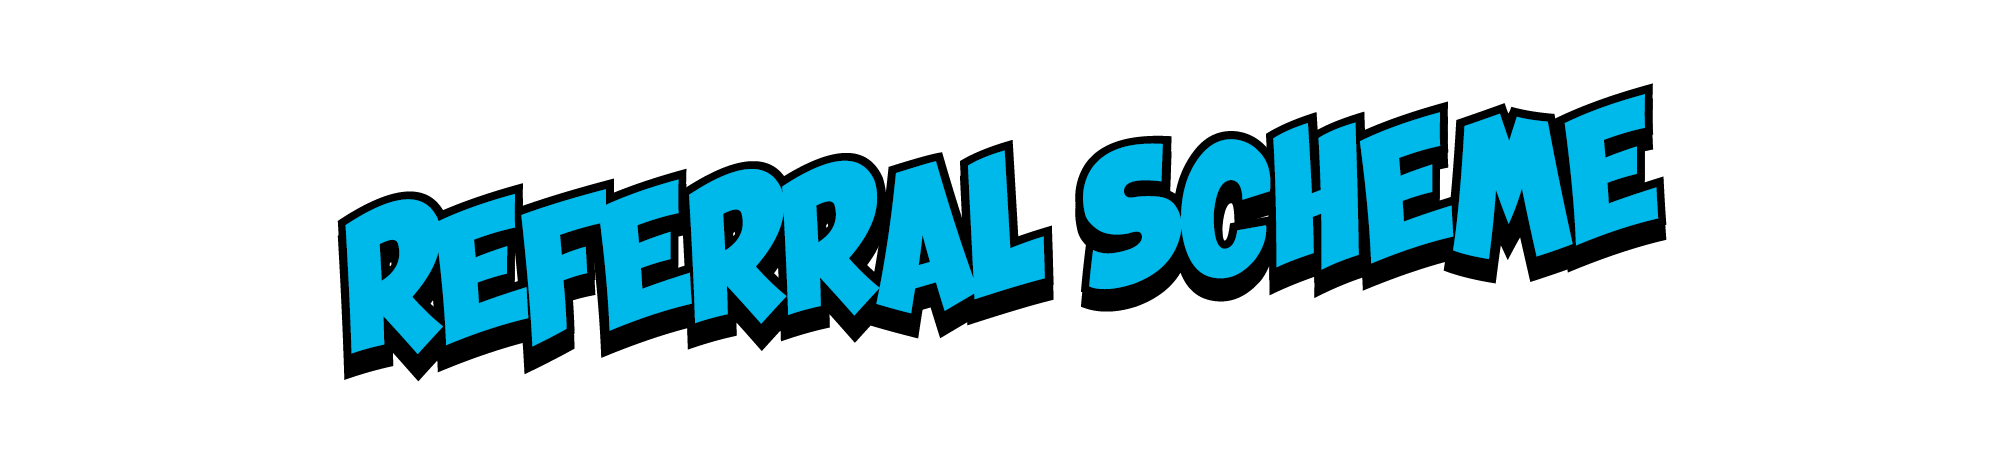 Referral Scheme from PureKat Consultancy